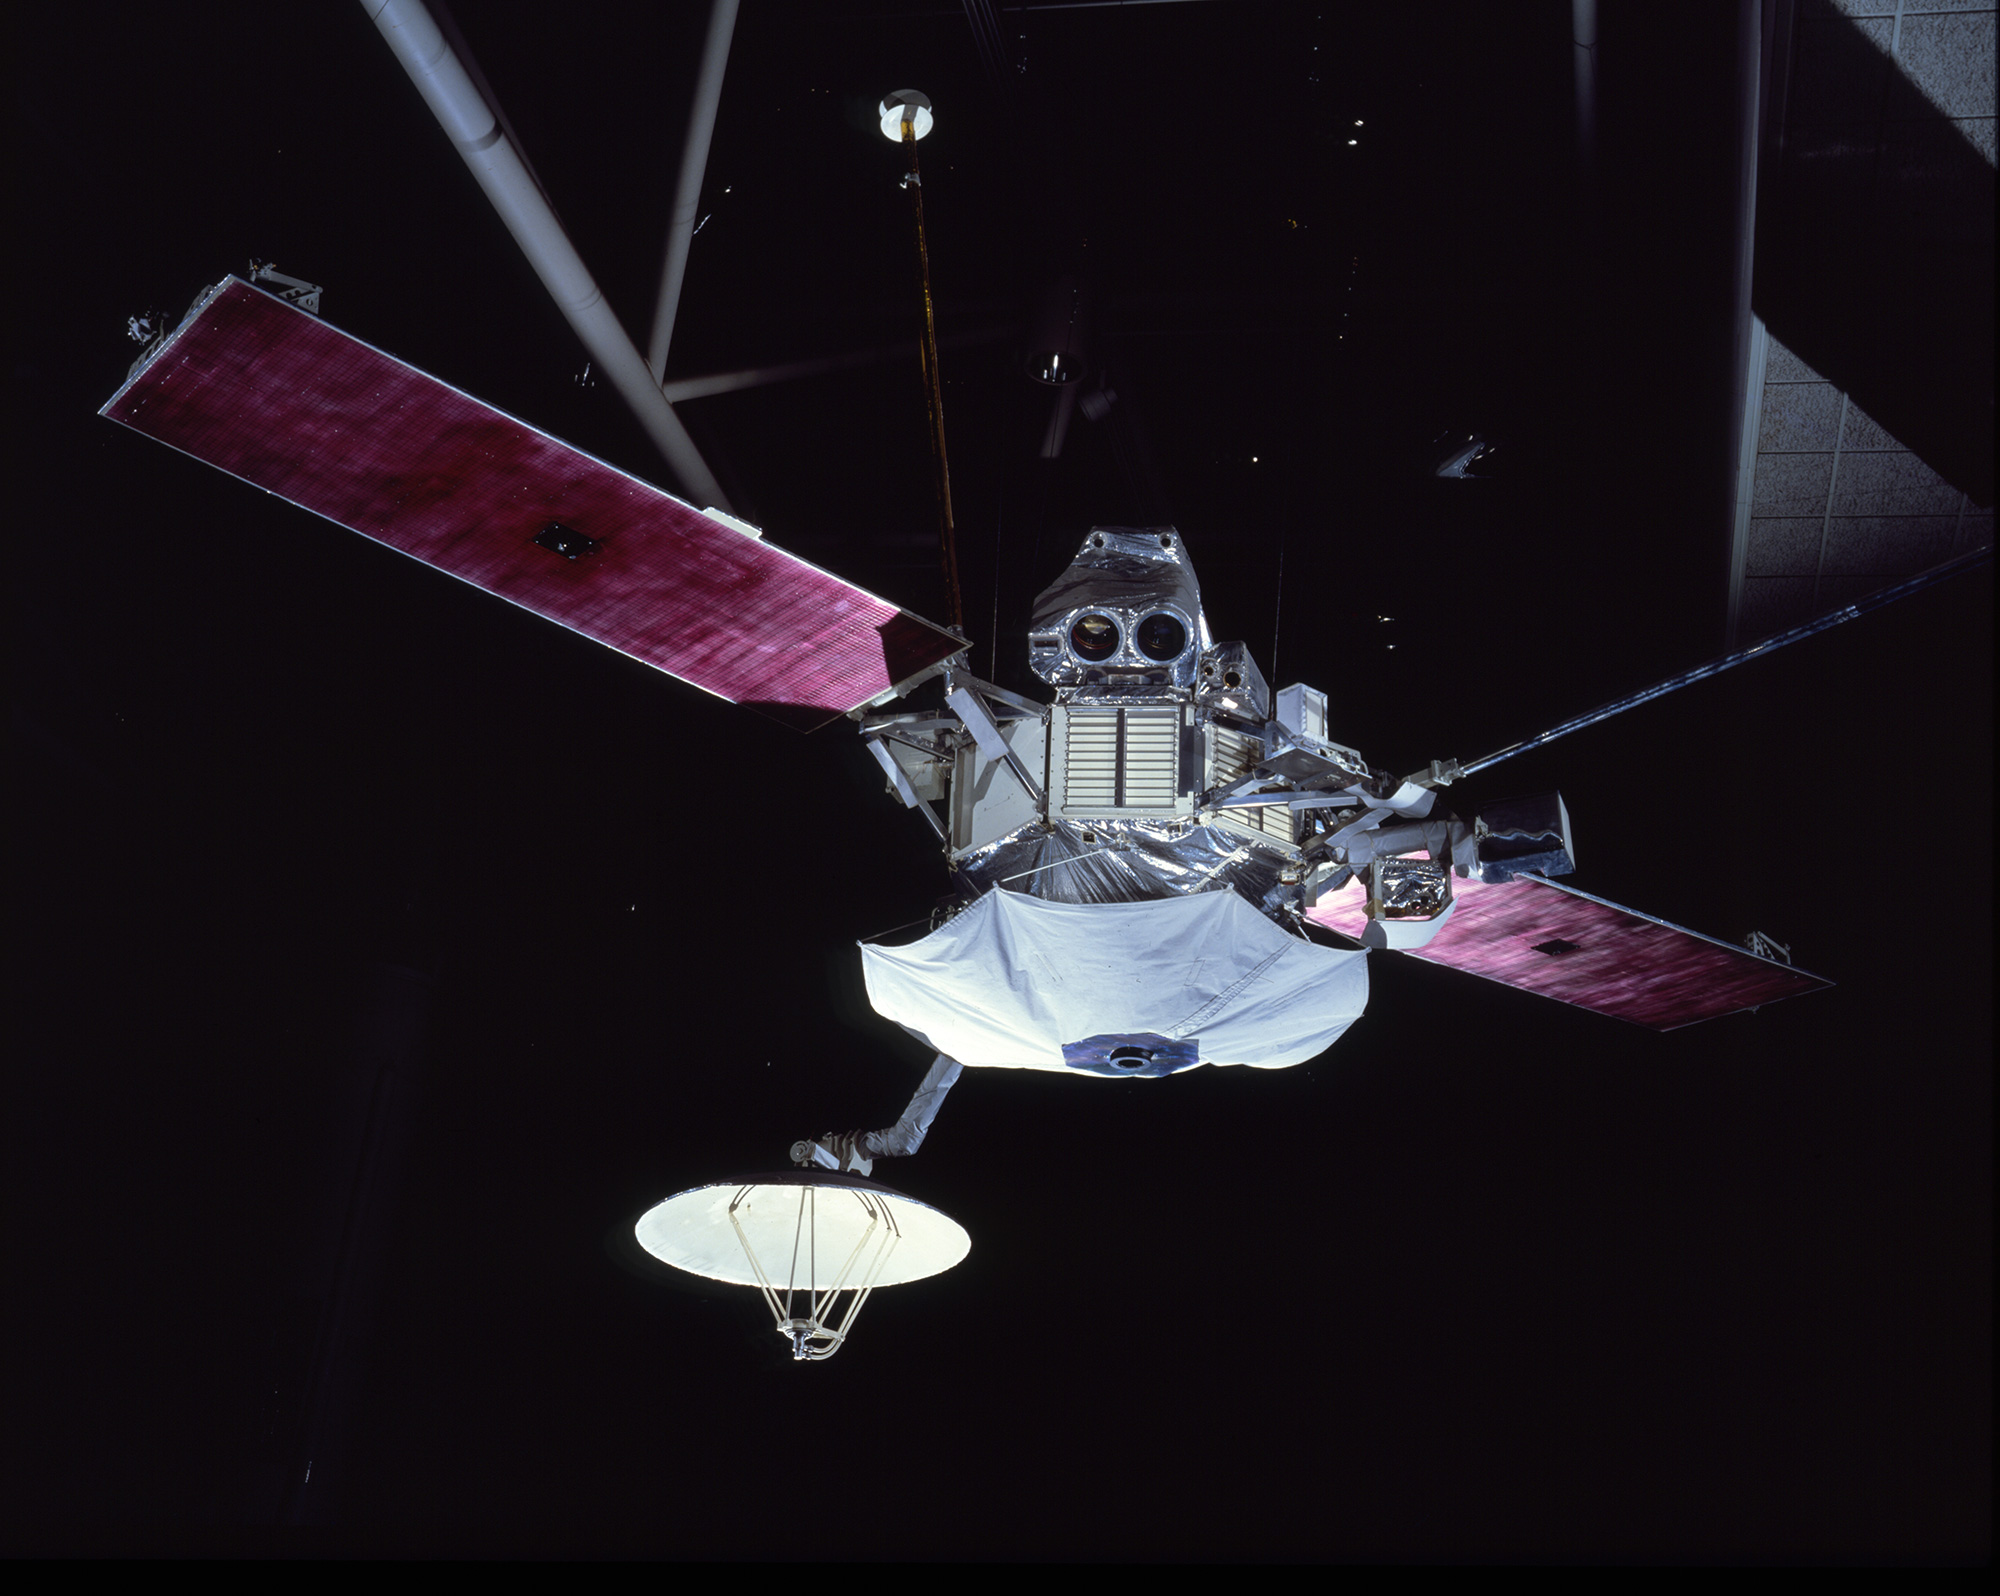 mariner 10 space probe - HD2000×1596